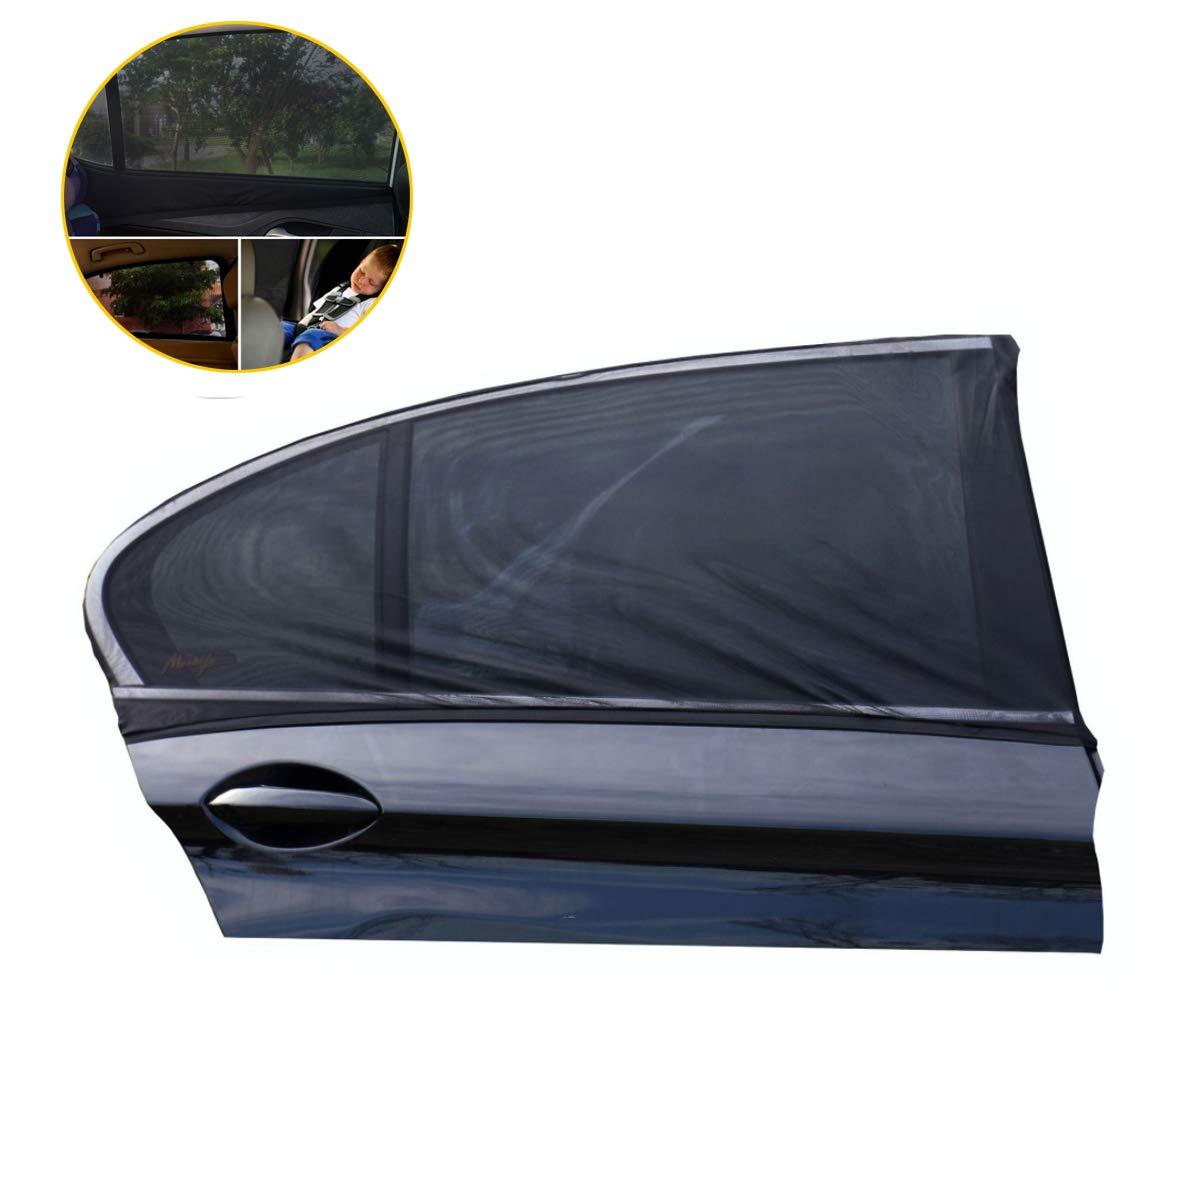 Black,120 * 50cm L window sunshade block UV anti-mosquito dustproof Child protection baby adult pet QJKJ 2 pieces Stroller sunshade portable car sunshade accessories